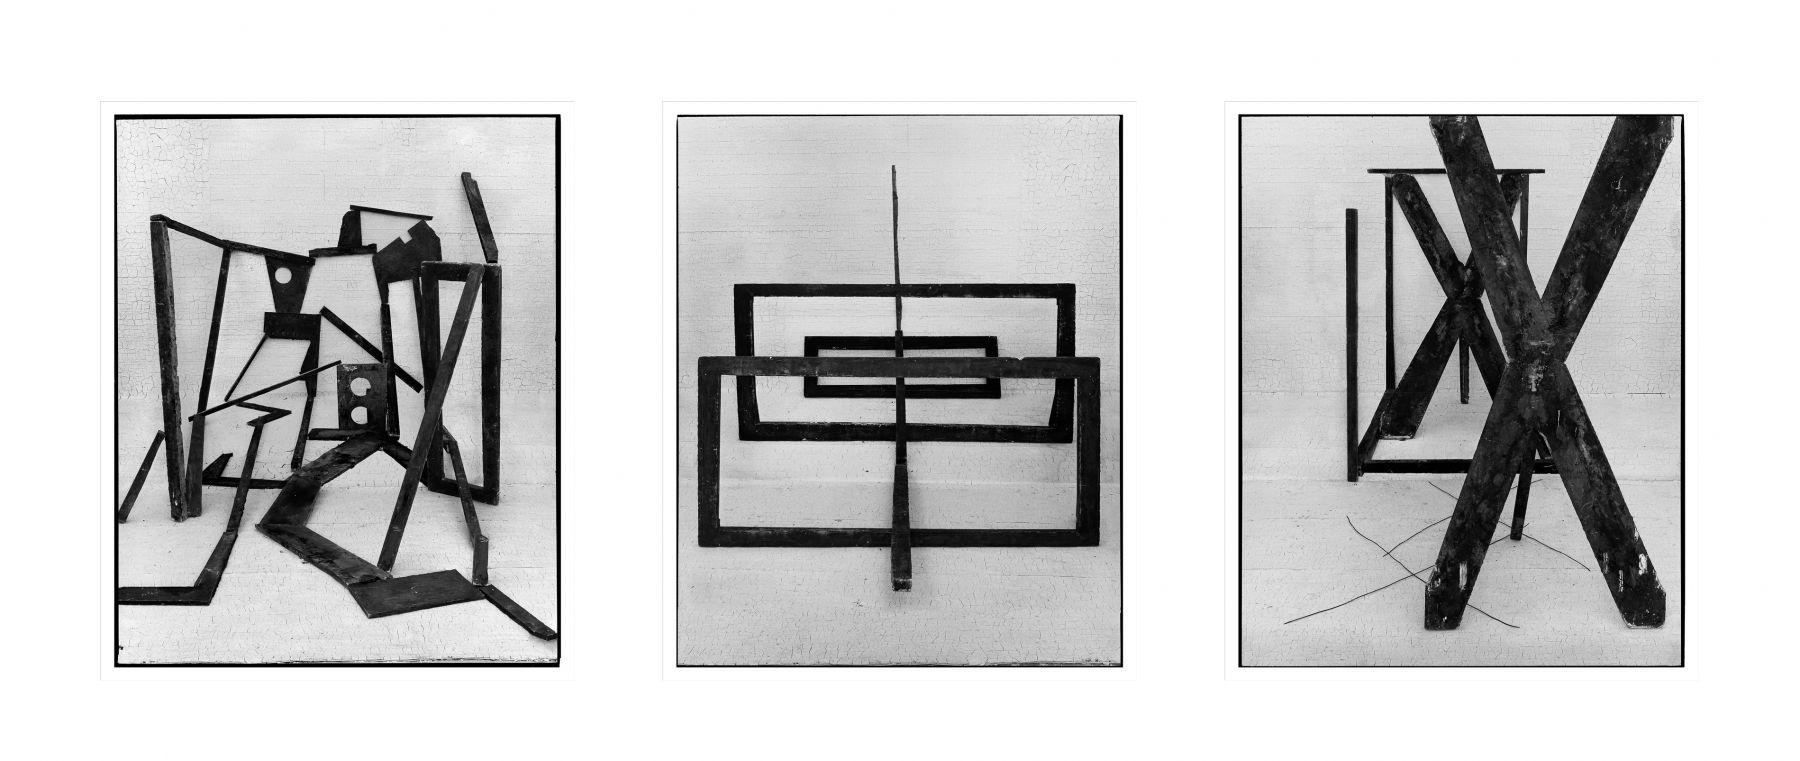 American Type images by Rodrigo Valenzuela